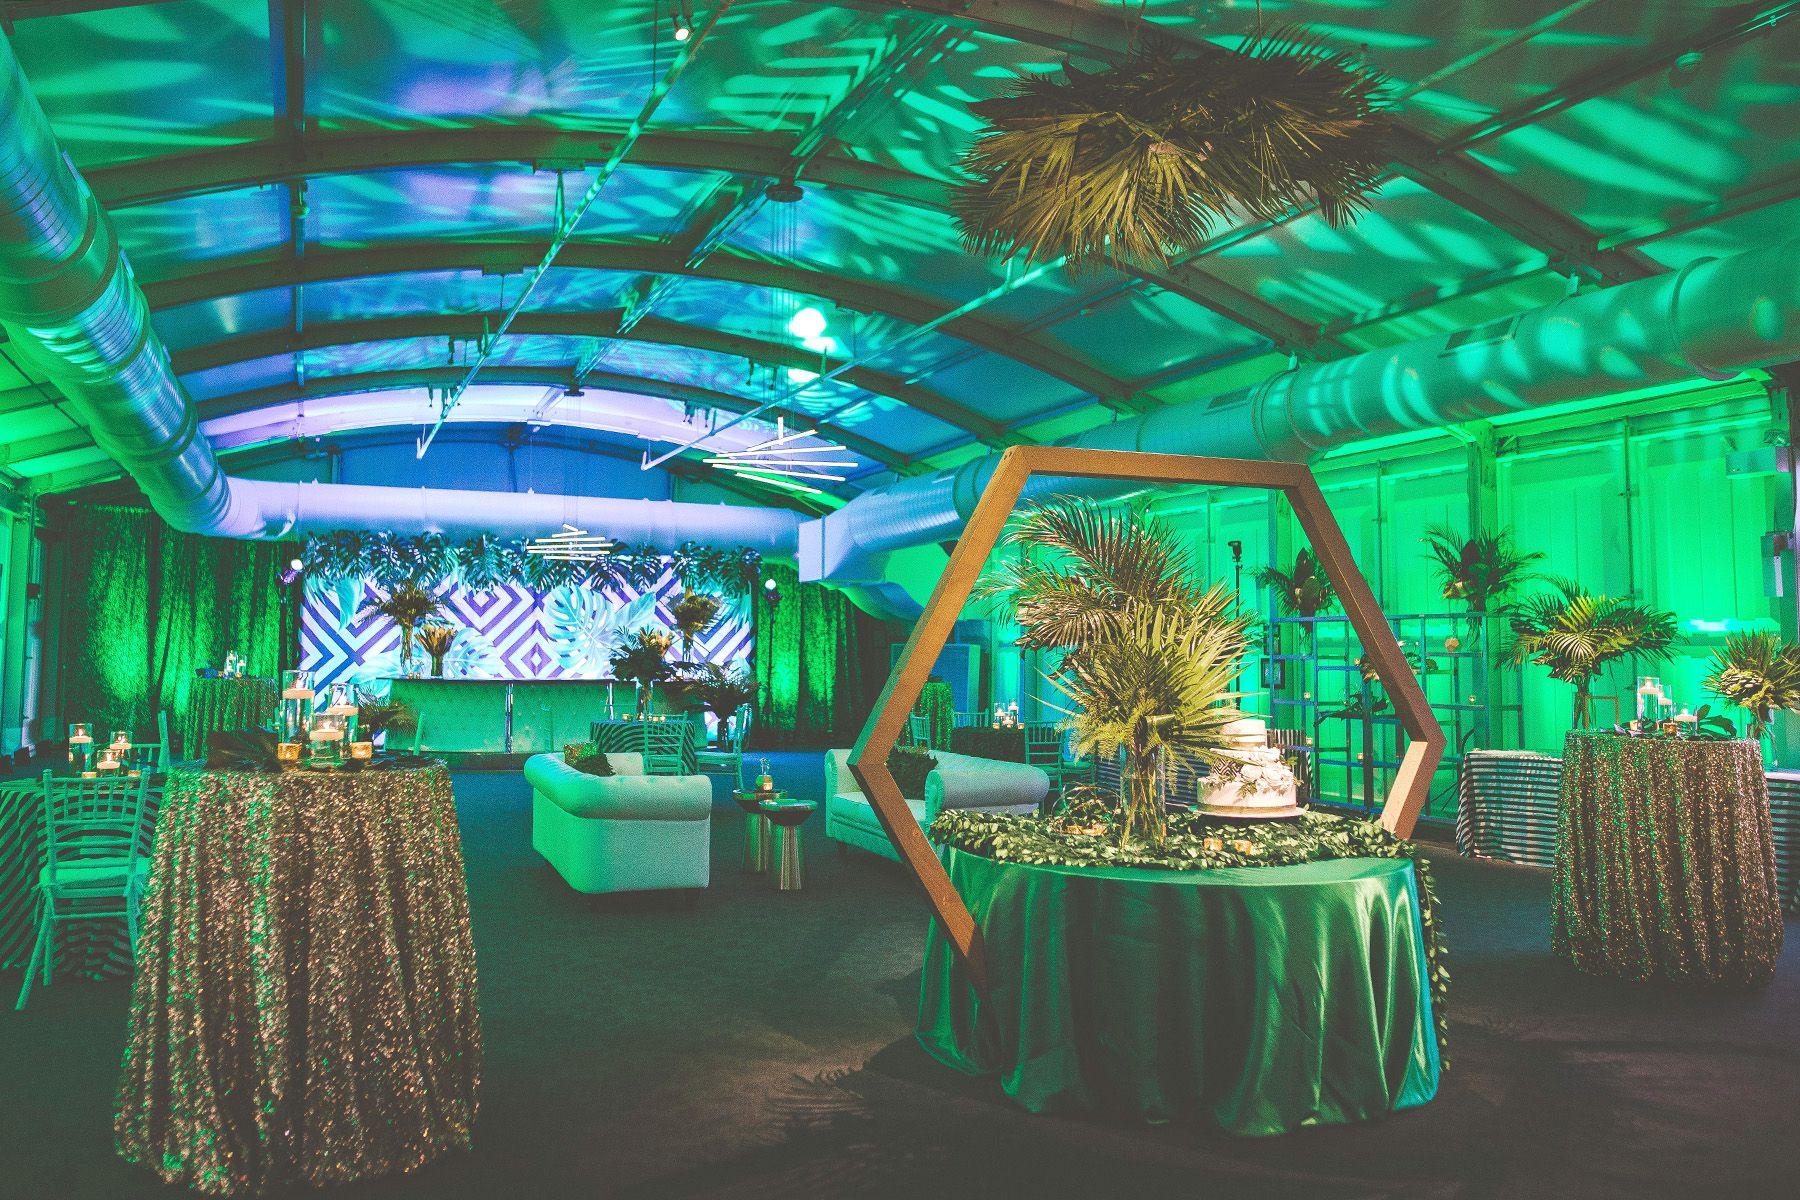 corporate-social-event-decor-planning-havanna-nights-tropical-dayton-cincinnati-columbus-unlimited-events_001.jpg